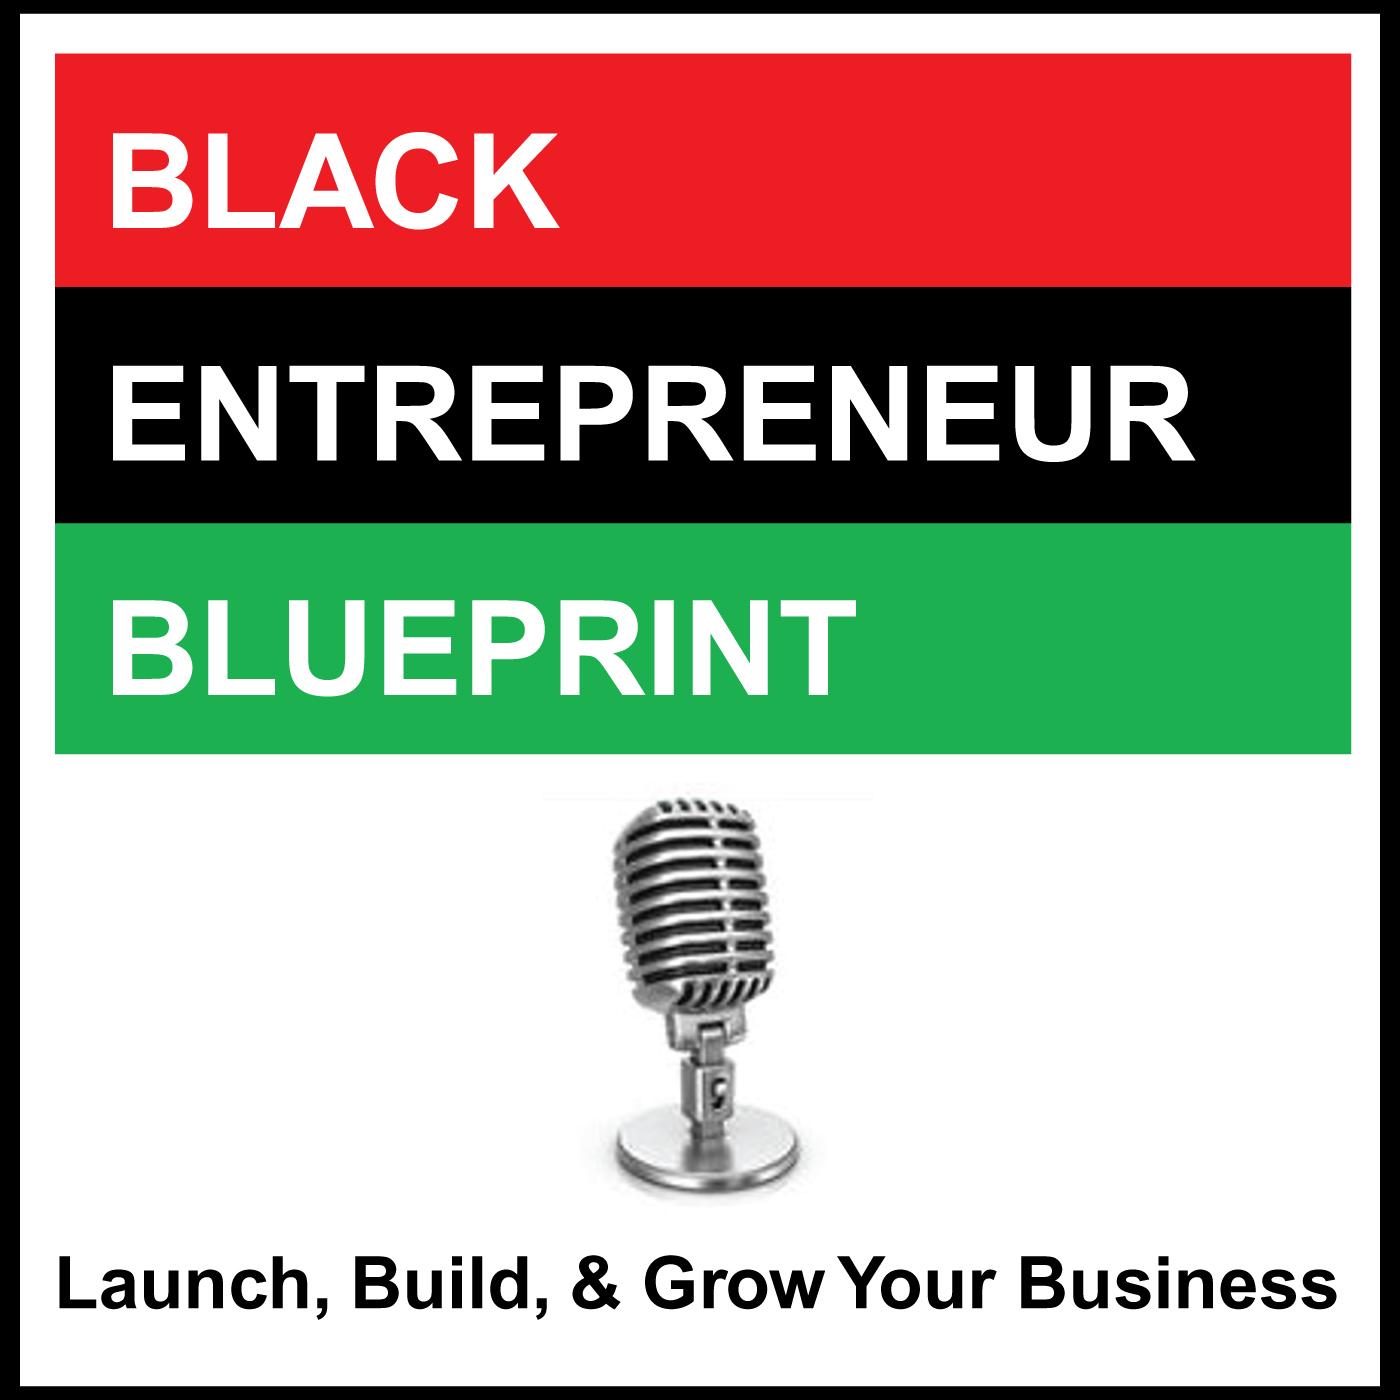 Black Entrepreneur Blueprint: 09 Leonard W. Stewart Esquire - The Power of Positioning